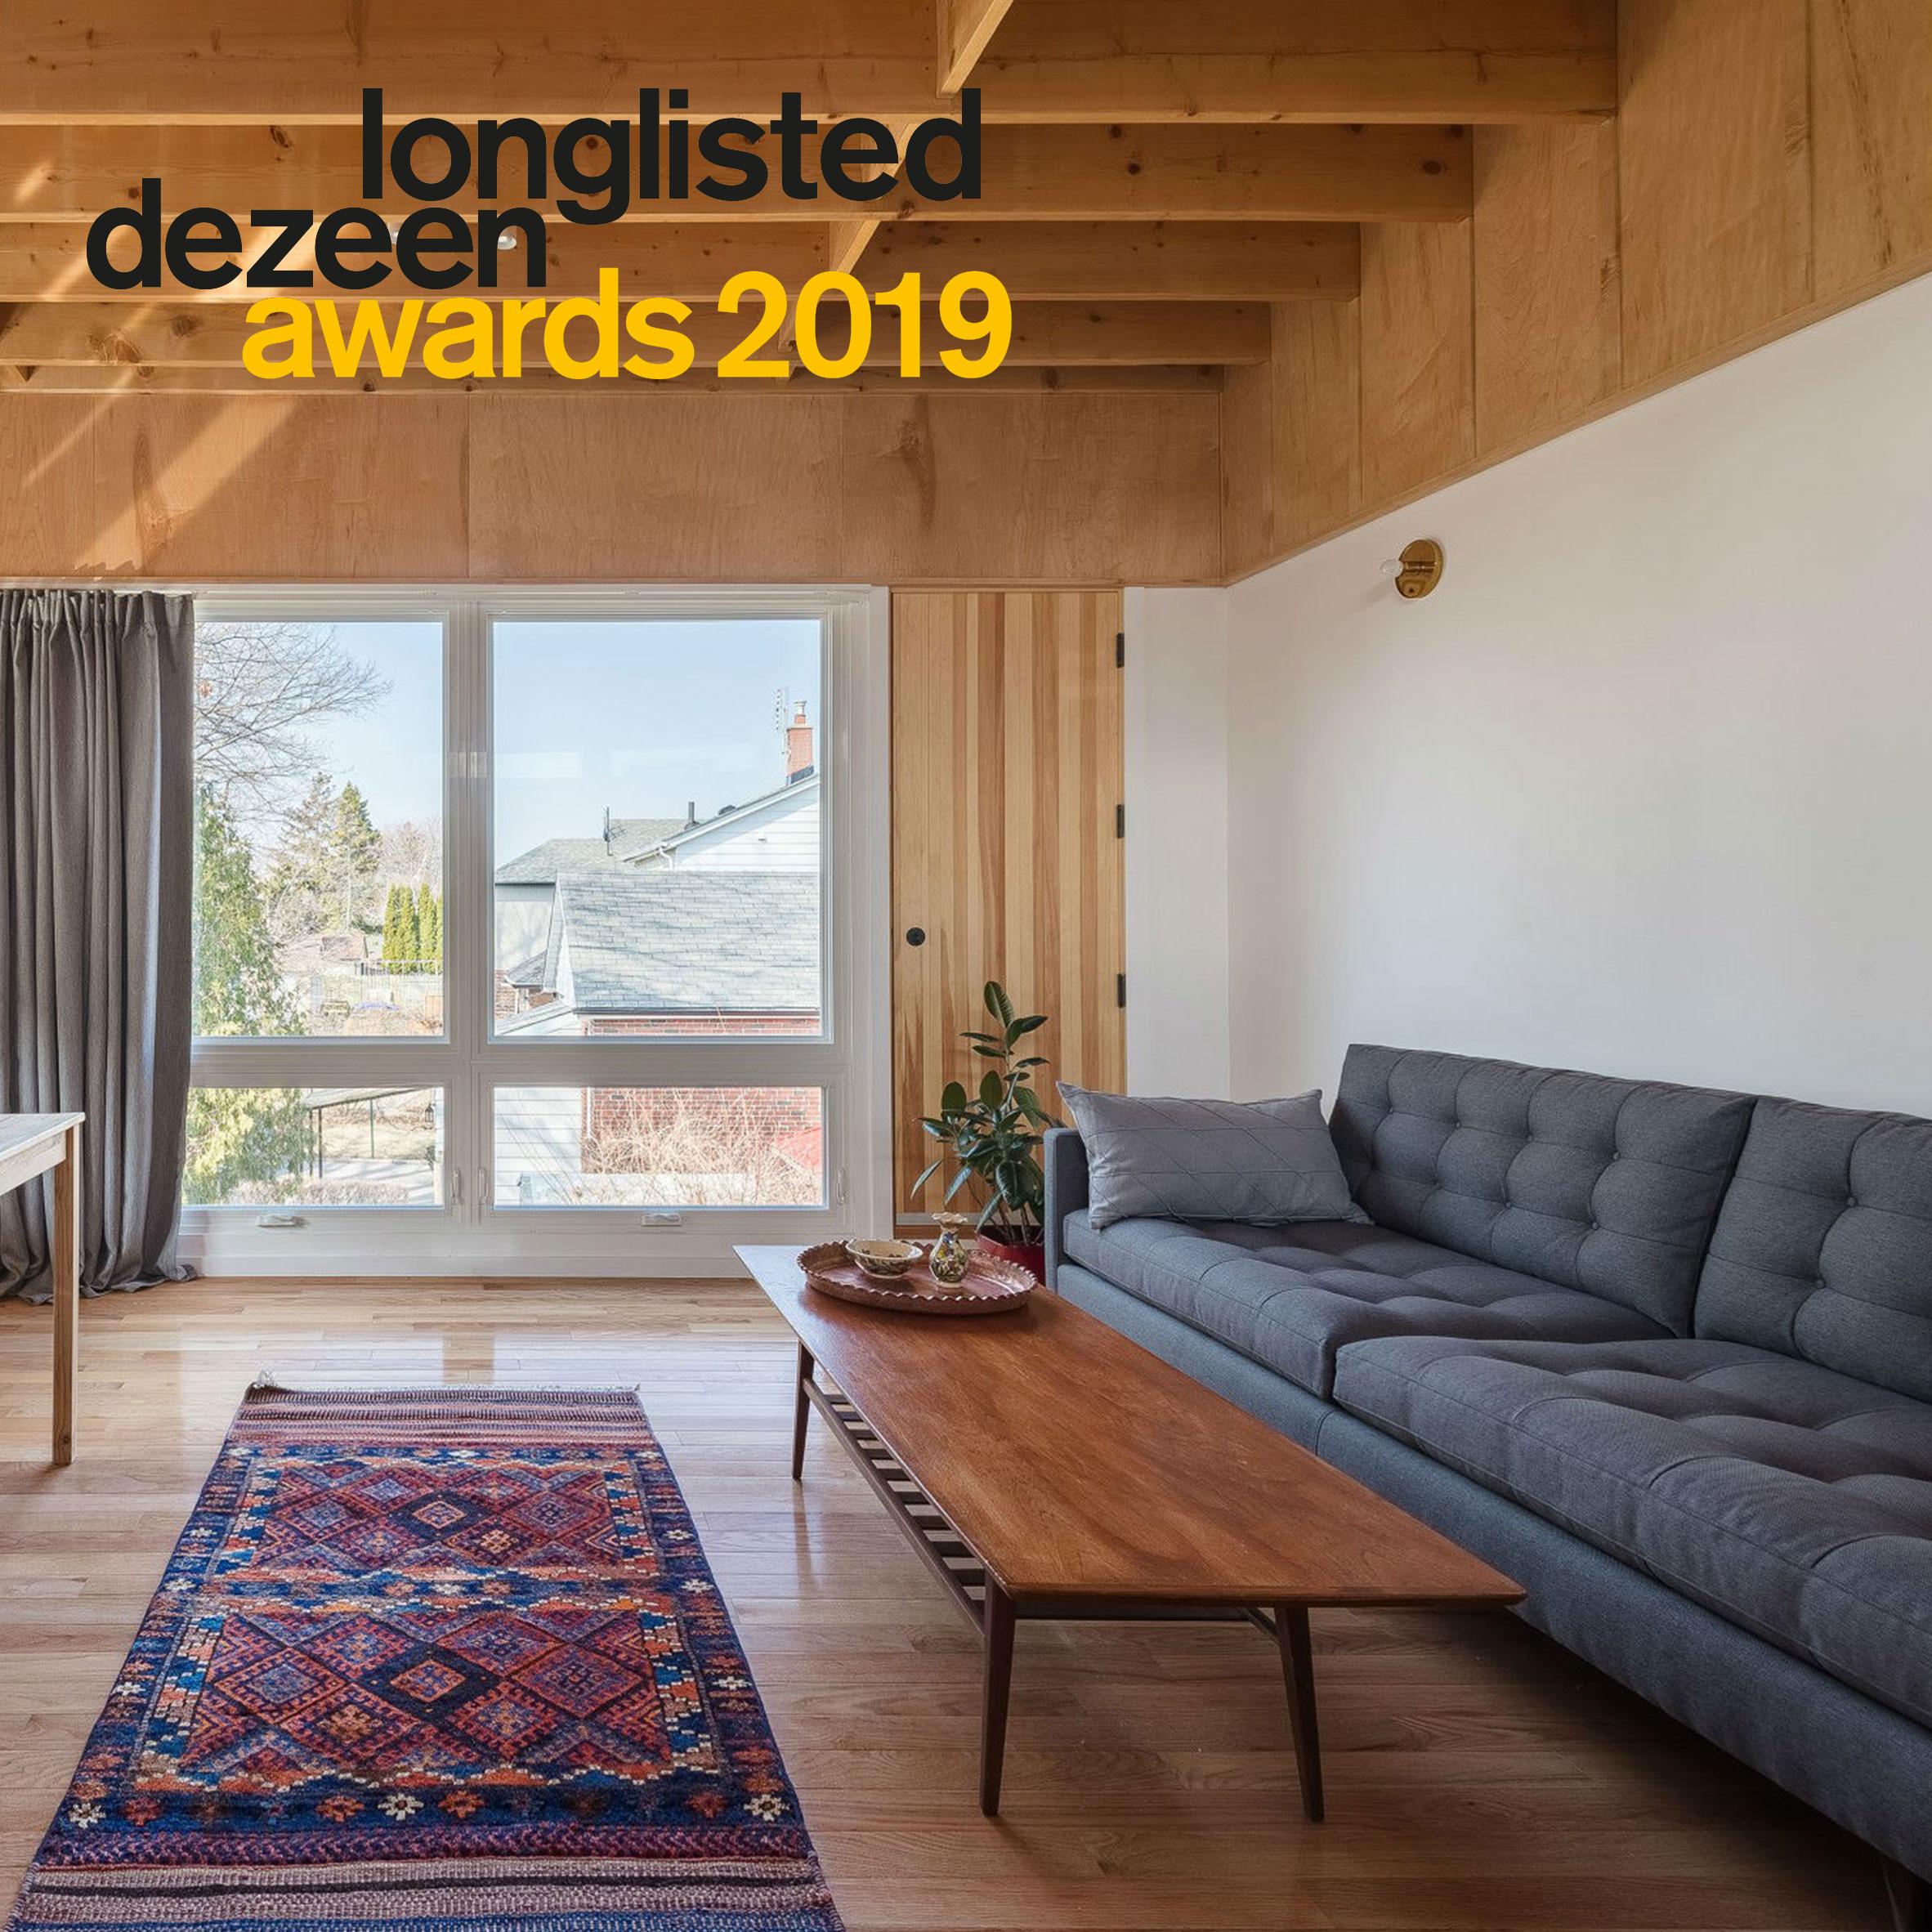 dezeen-awards-2019-longlist-east-york-residence-Int.jpg